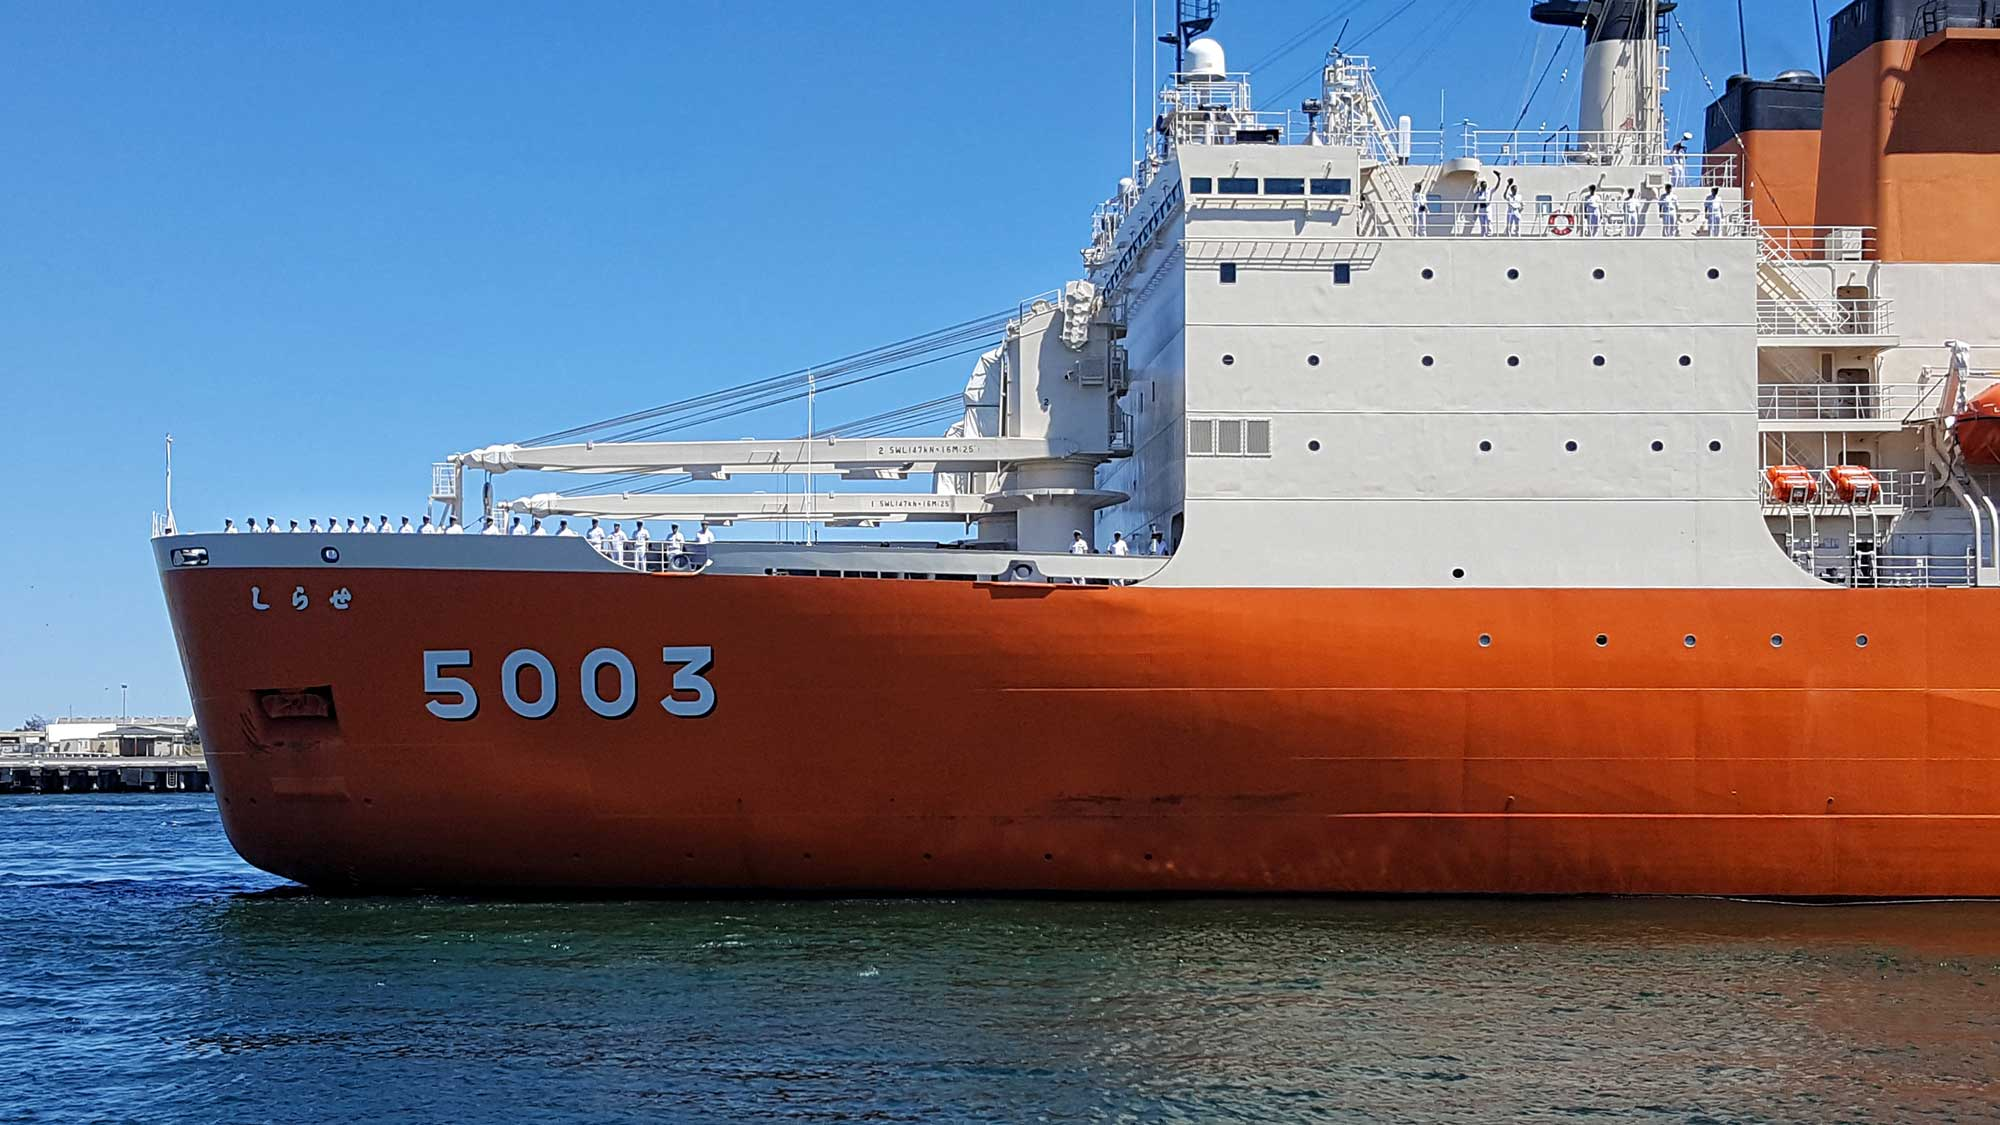 shirase-ship-japanese-icebreaker-fremantle-2